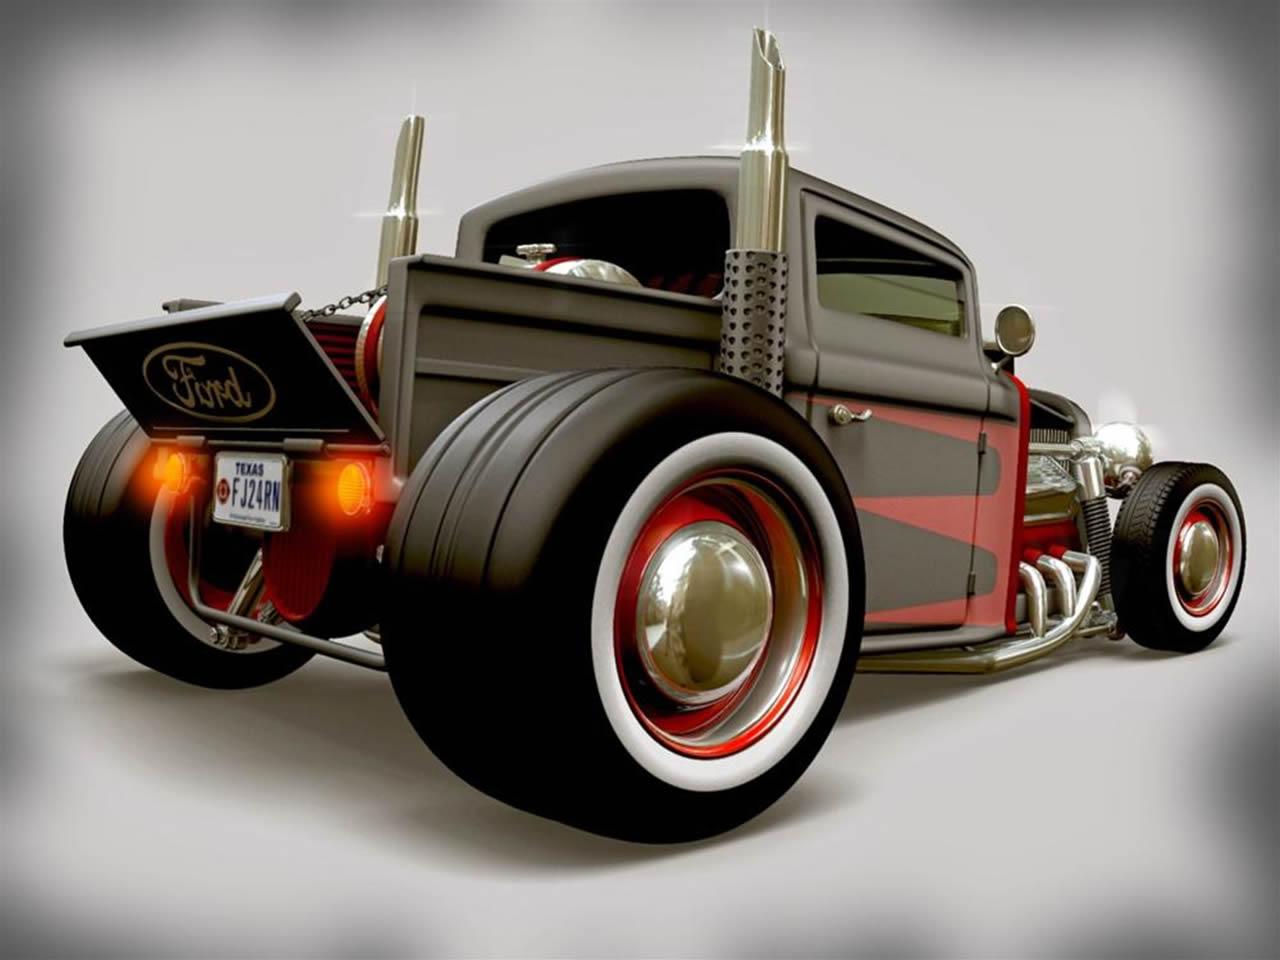 Imagenes De Autos Hd Wallpapers24 Hd: IMAGENES: IMAGENES DE AUTOS HD 3D WALLPAPERS